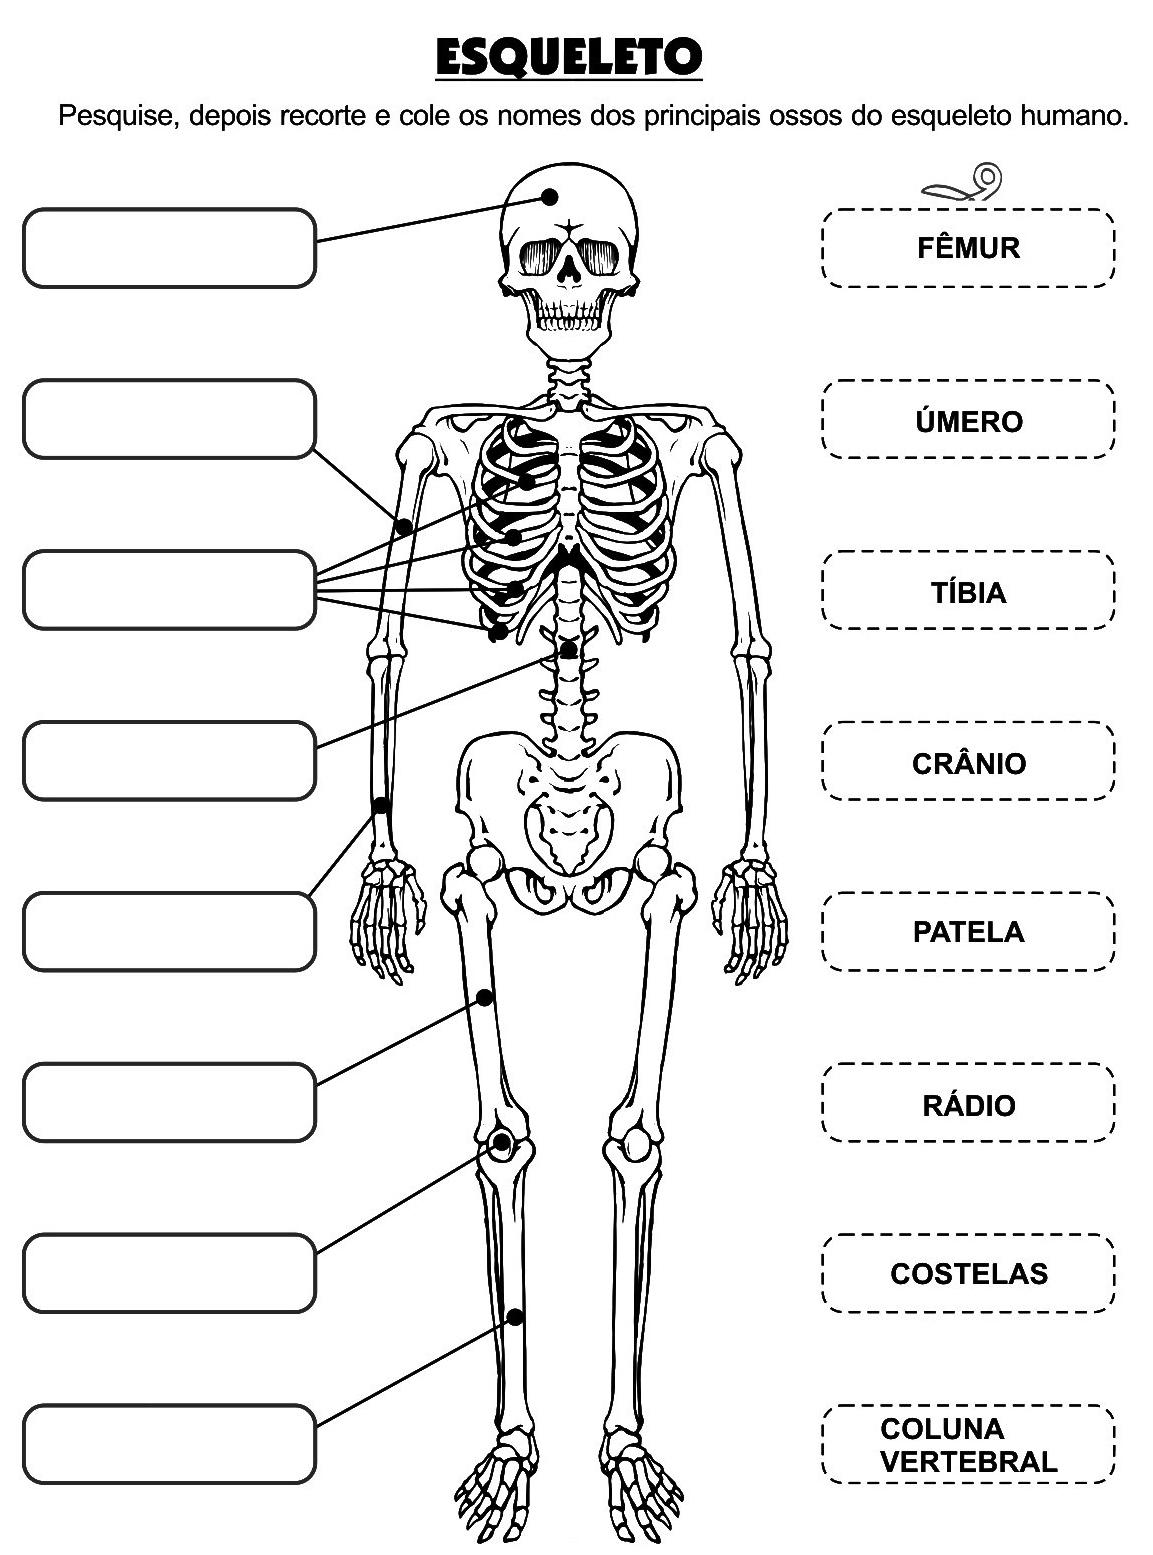 Atividades da tia: ATIVIDADES CORPO HUMANO 3° 4° 5° 6° ANOS ...